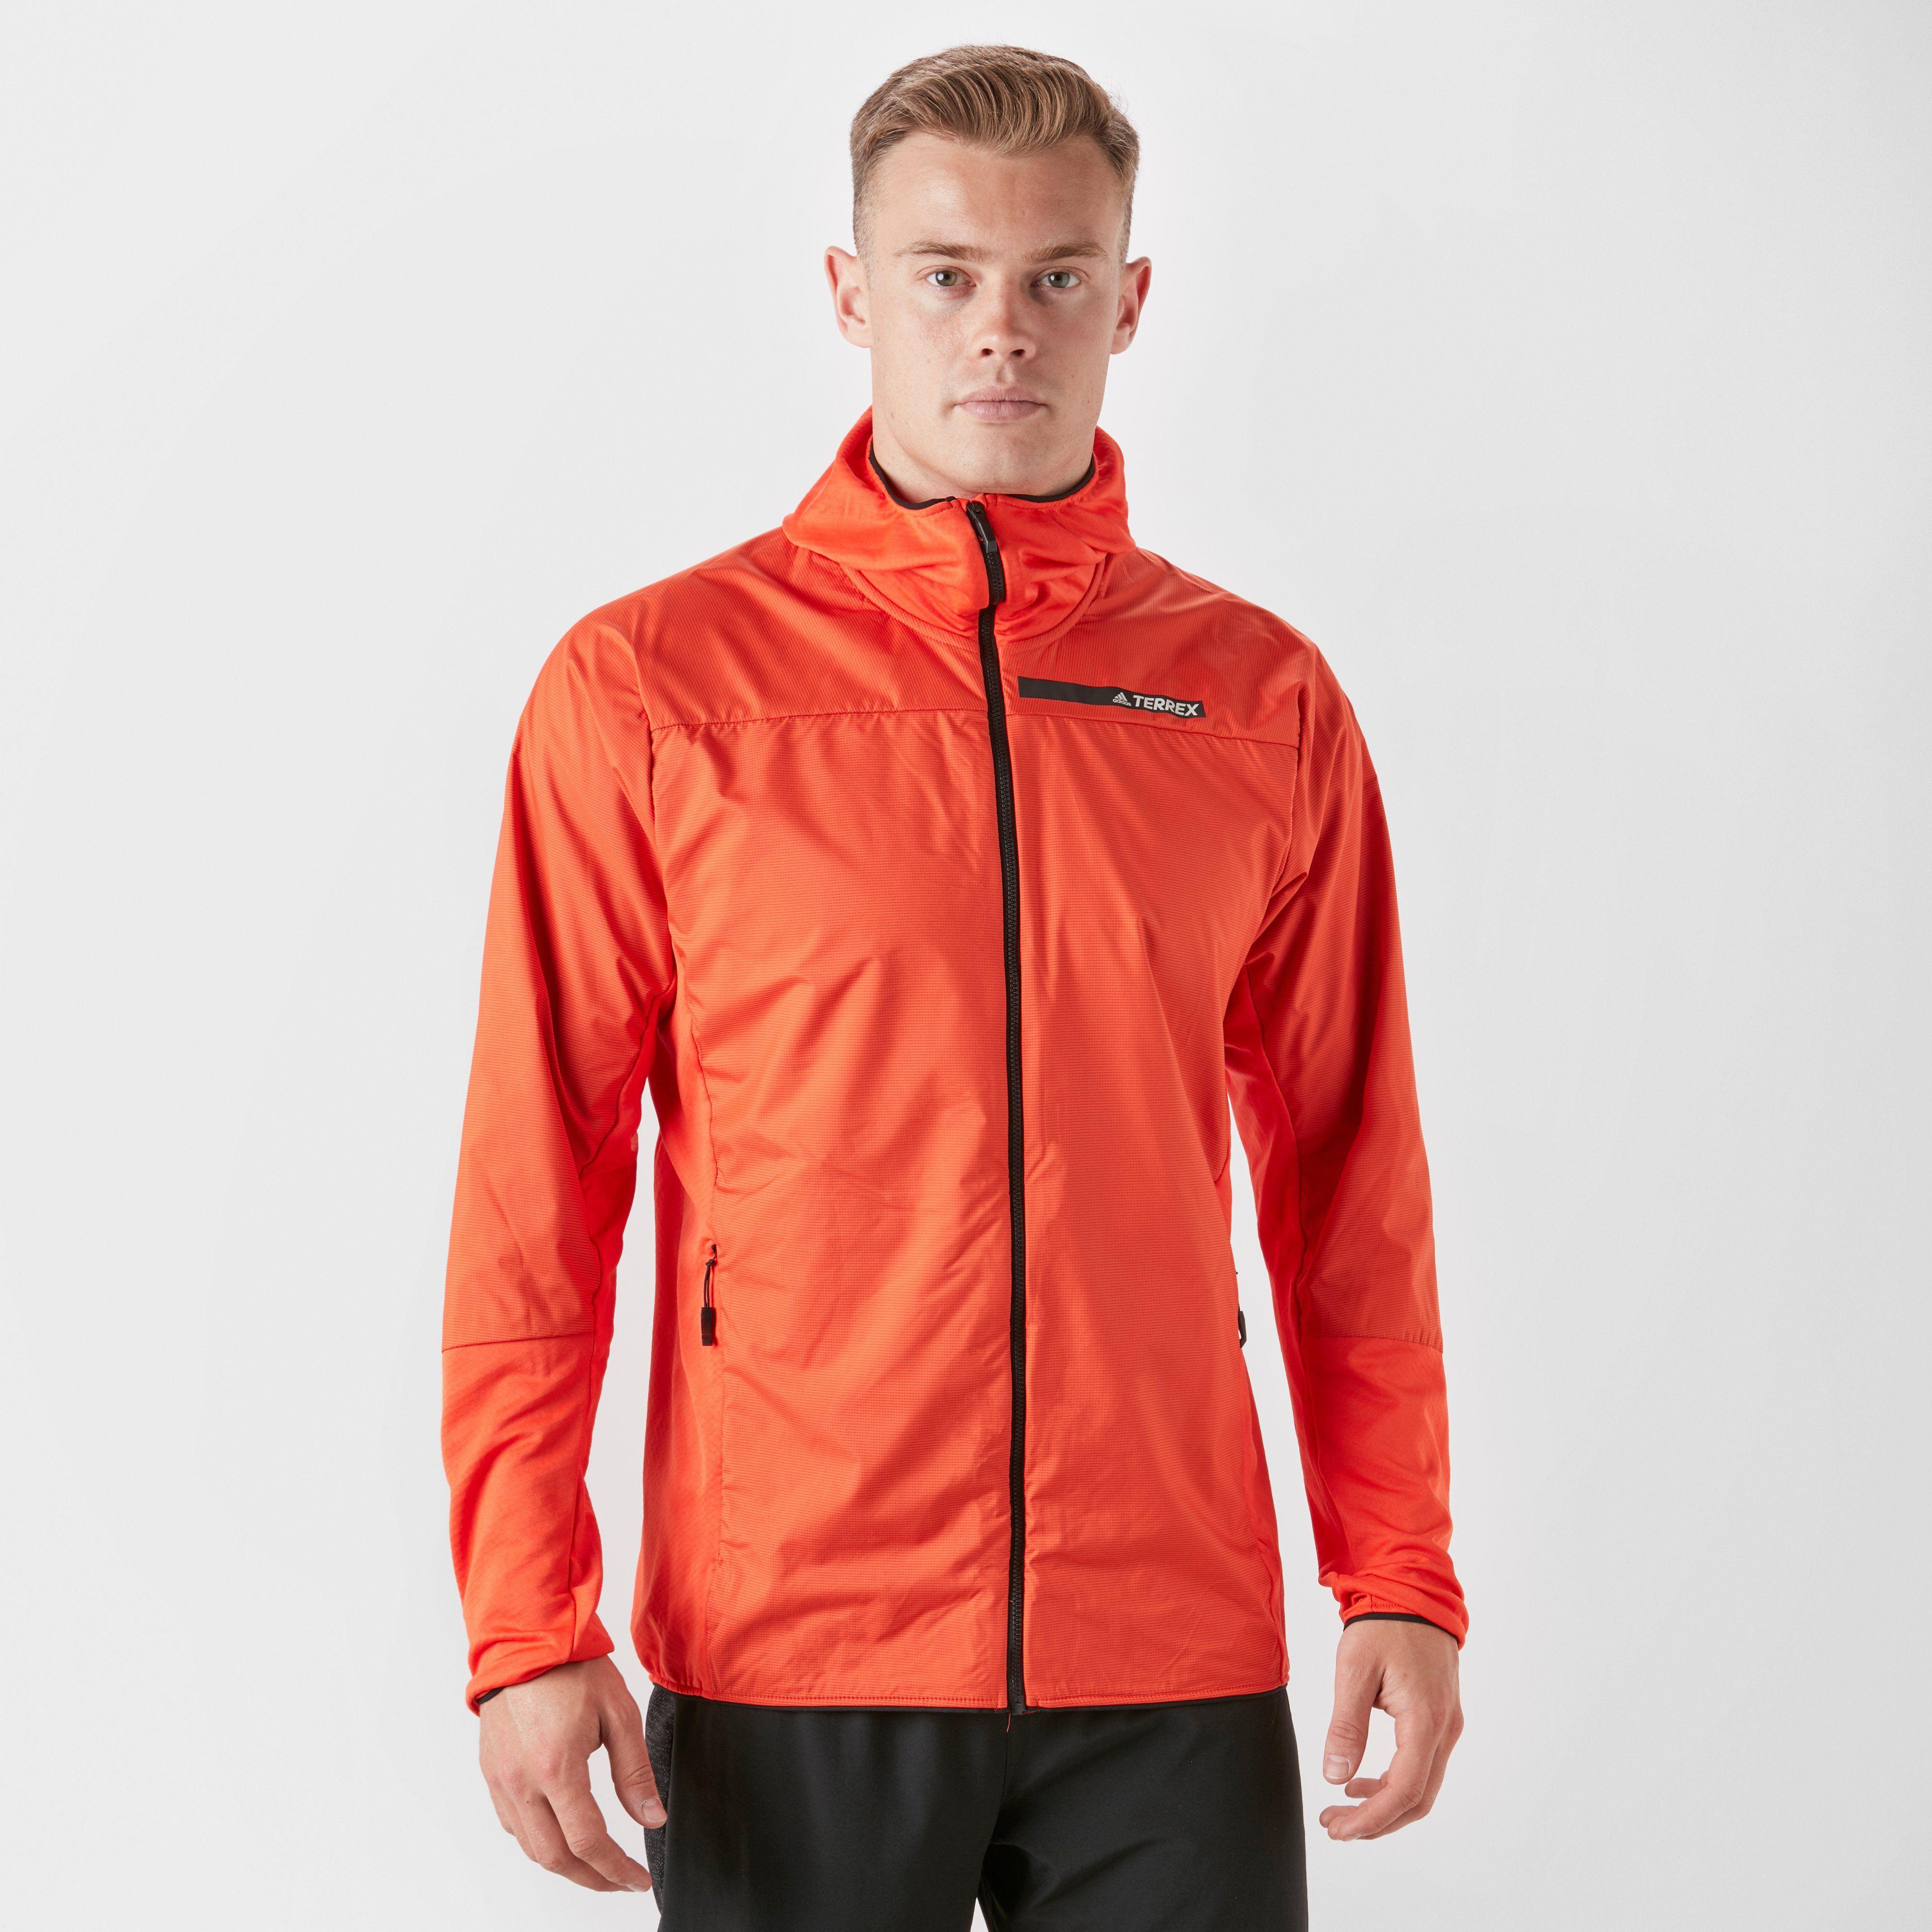 ADIDAS Men's Terrex Sky Climb Insulated Jacket